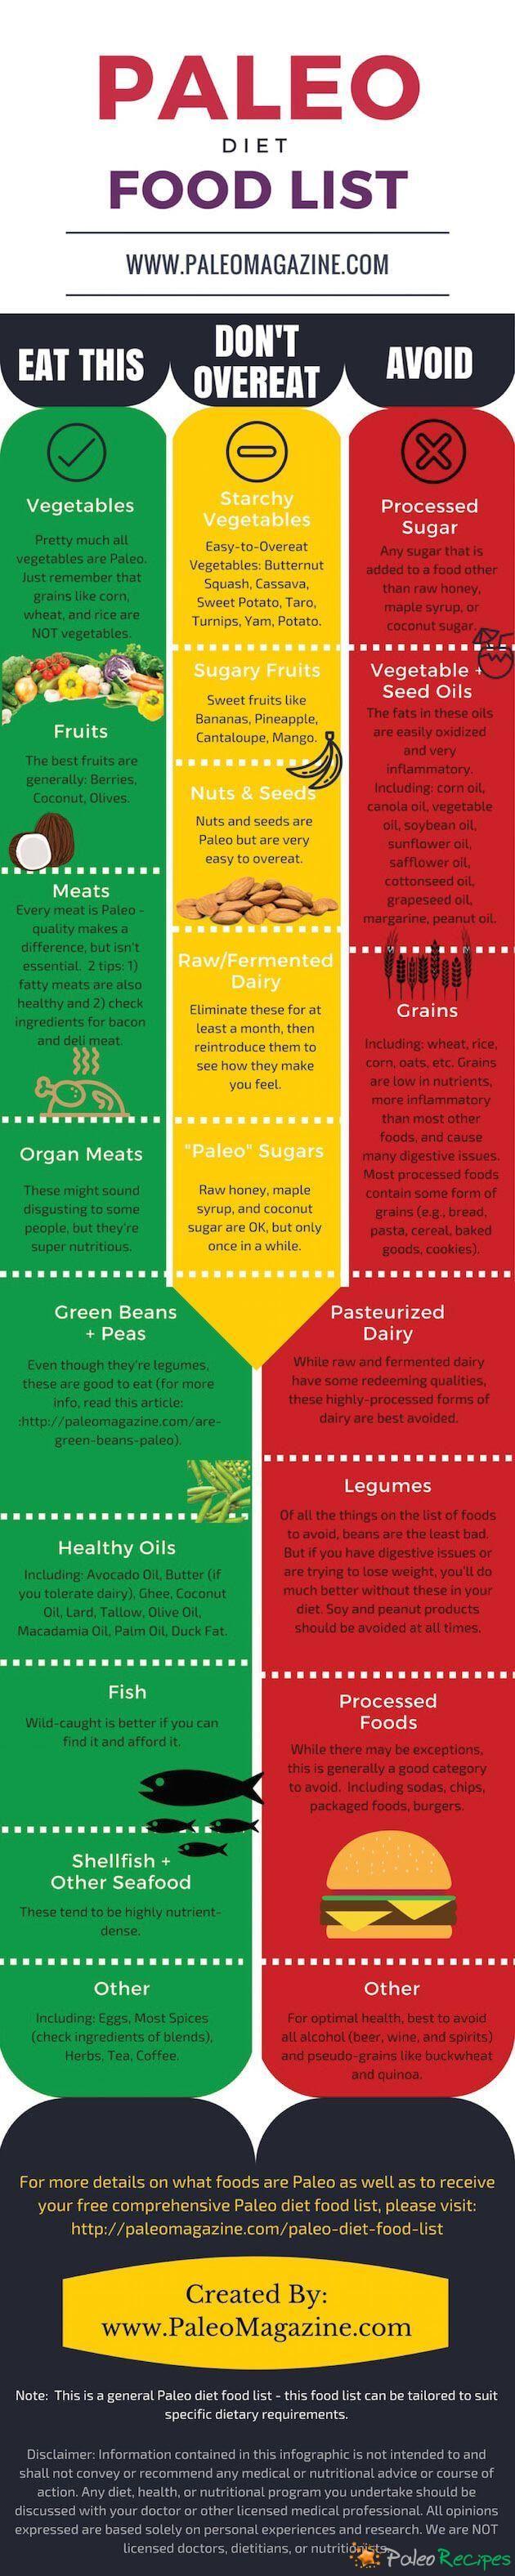 30minute Recipes Diet Food List Paleo Recipes Smoothies Paleo Diet Food List Paleo Diet Recipes How To Eat Paleo